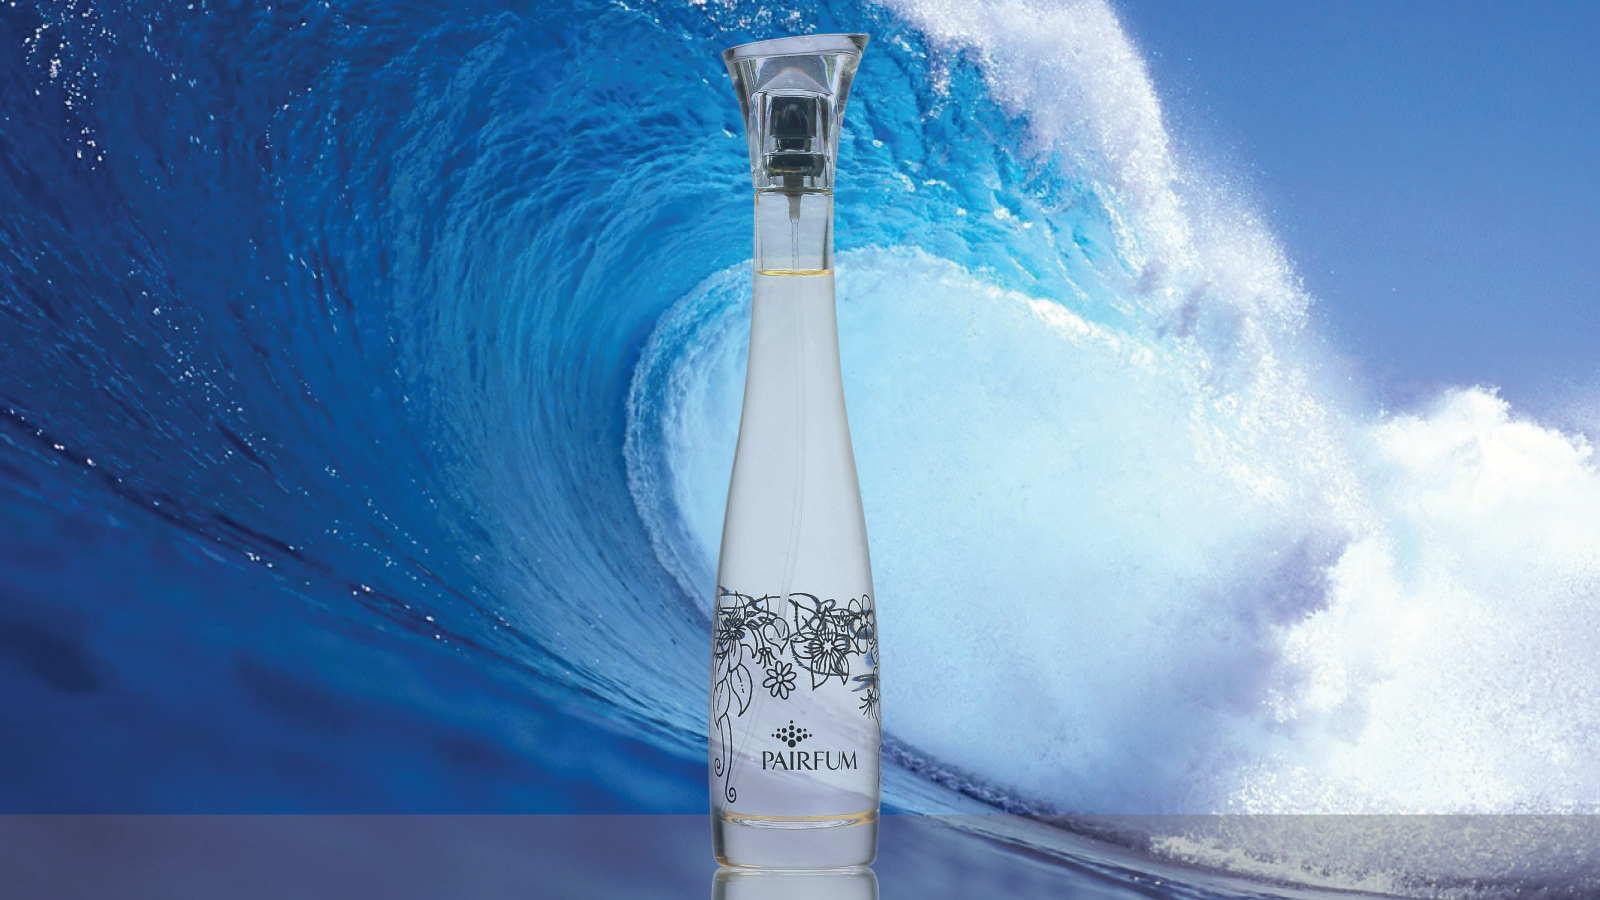 Flacon Room Perfume Spray Marine Wave 16 9